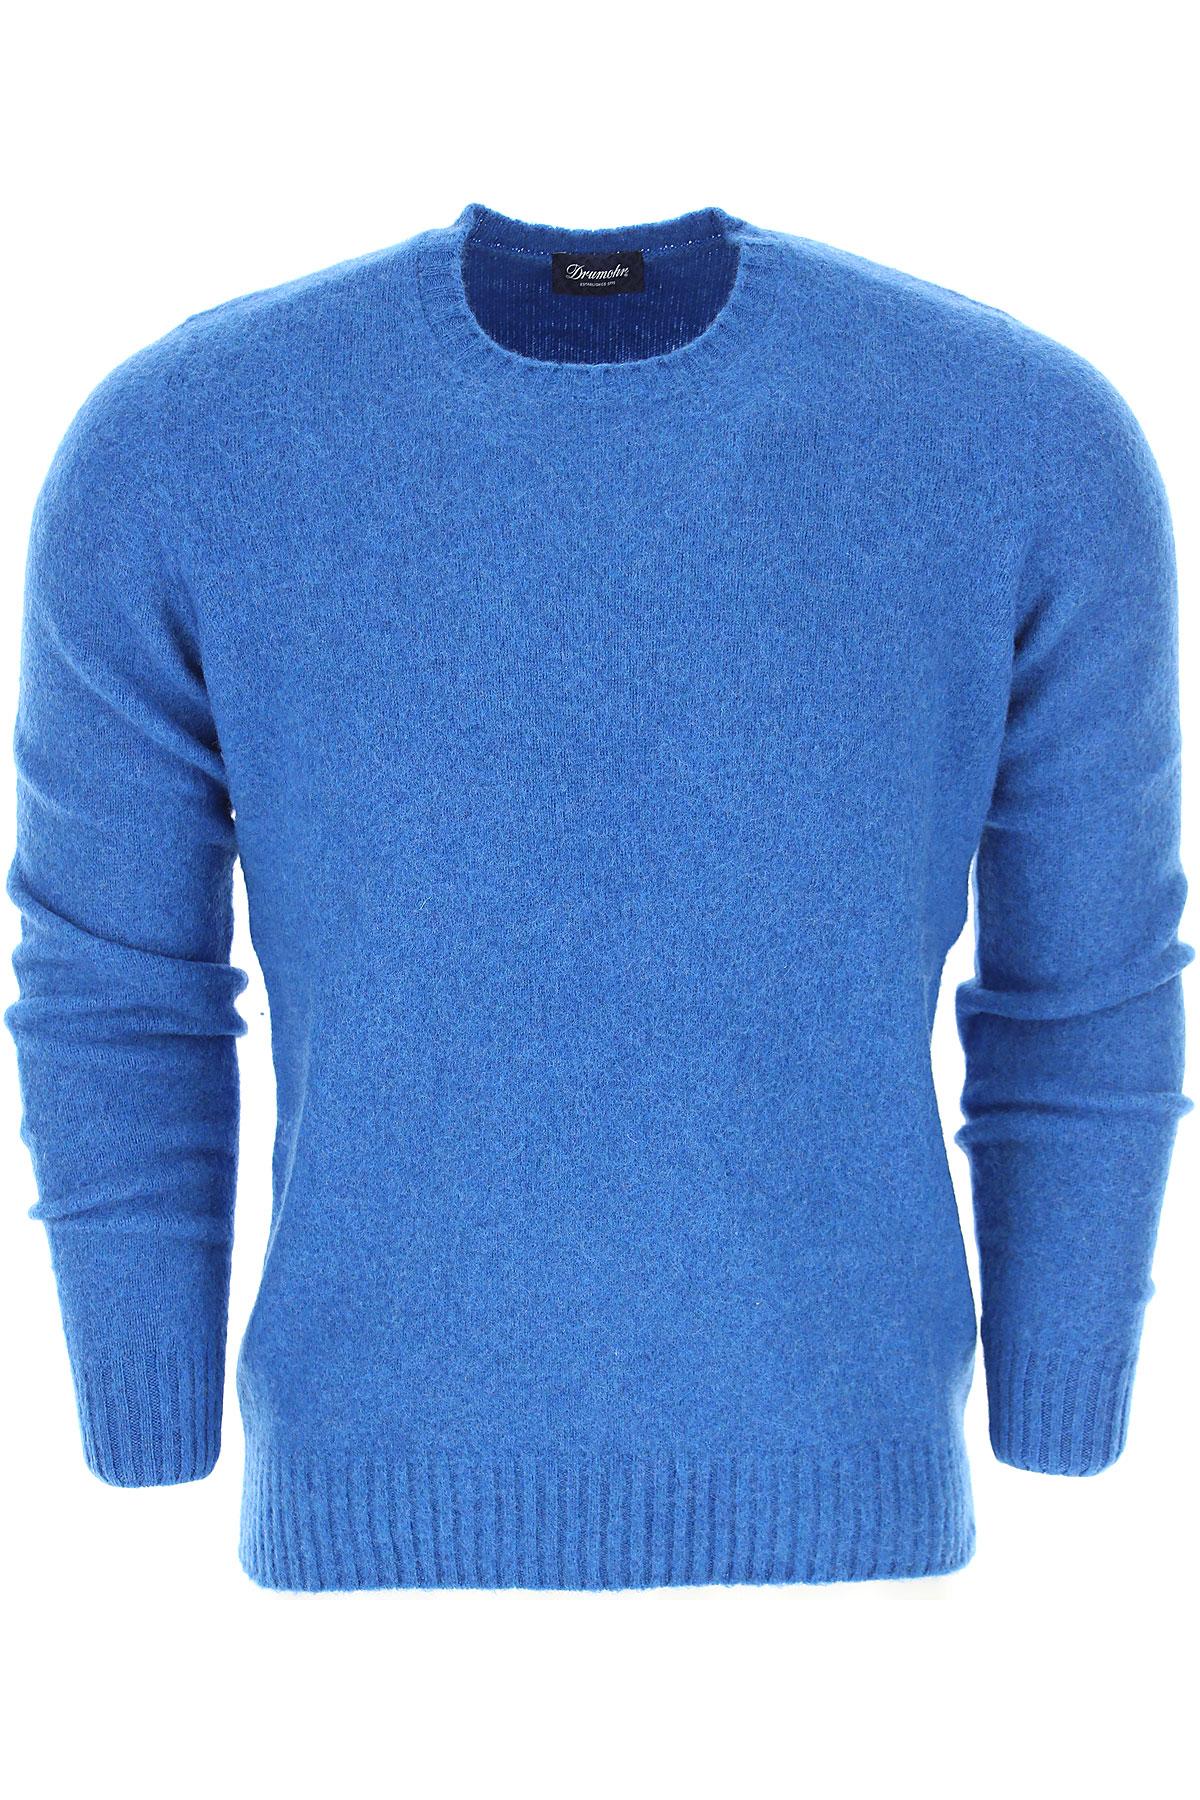 Image of Drumohr Sweater for Men Jumper, Azure, Wool, 2017, L M S XL